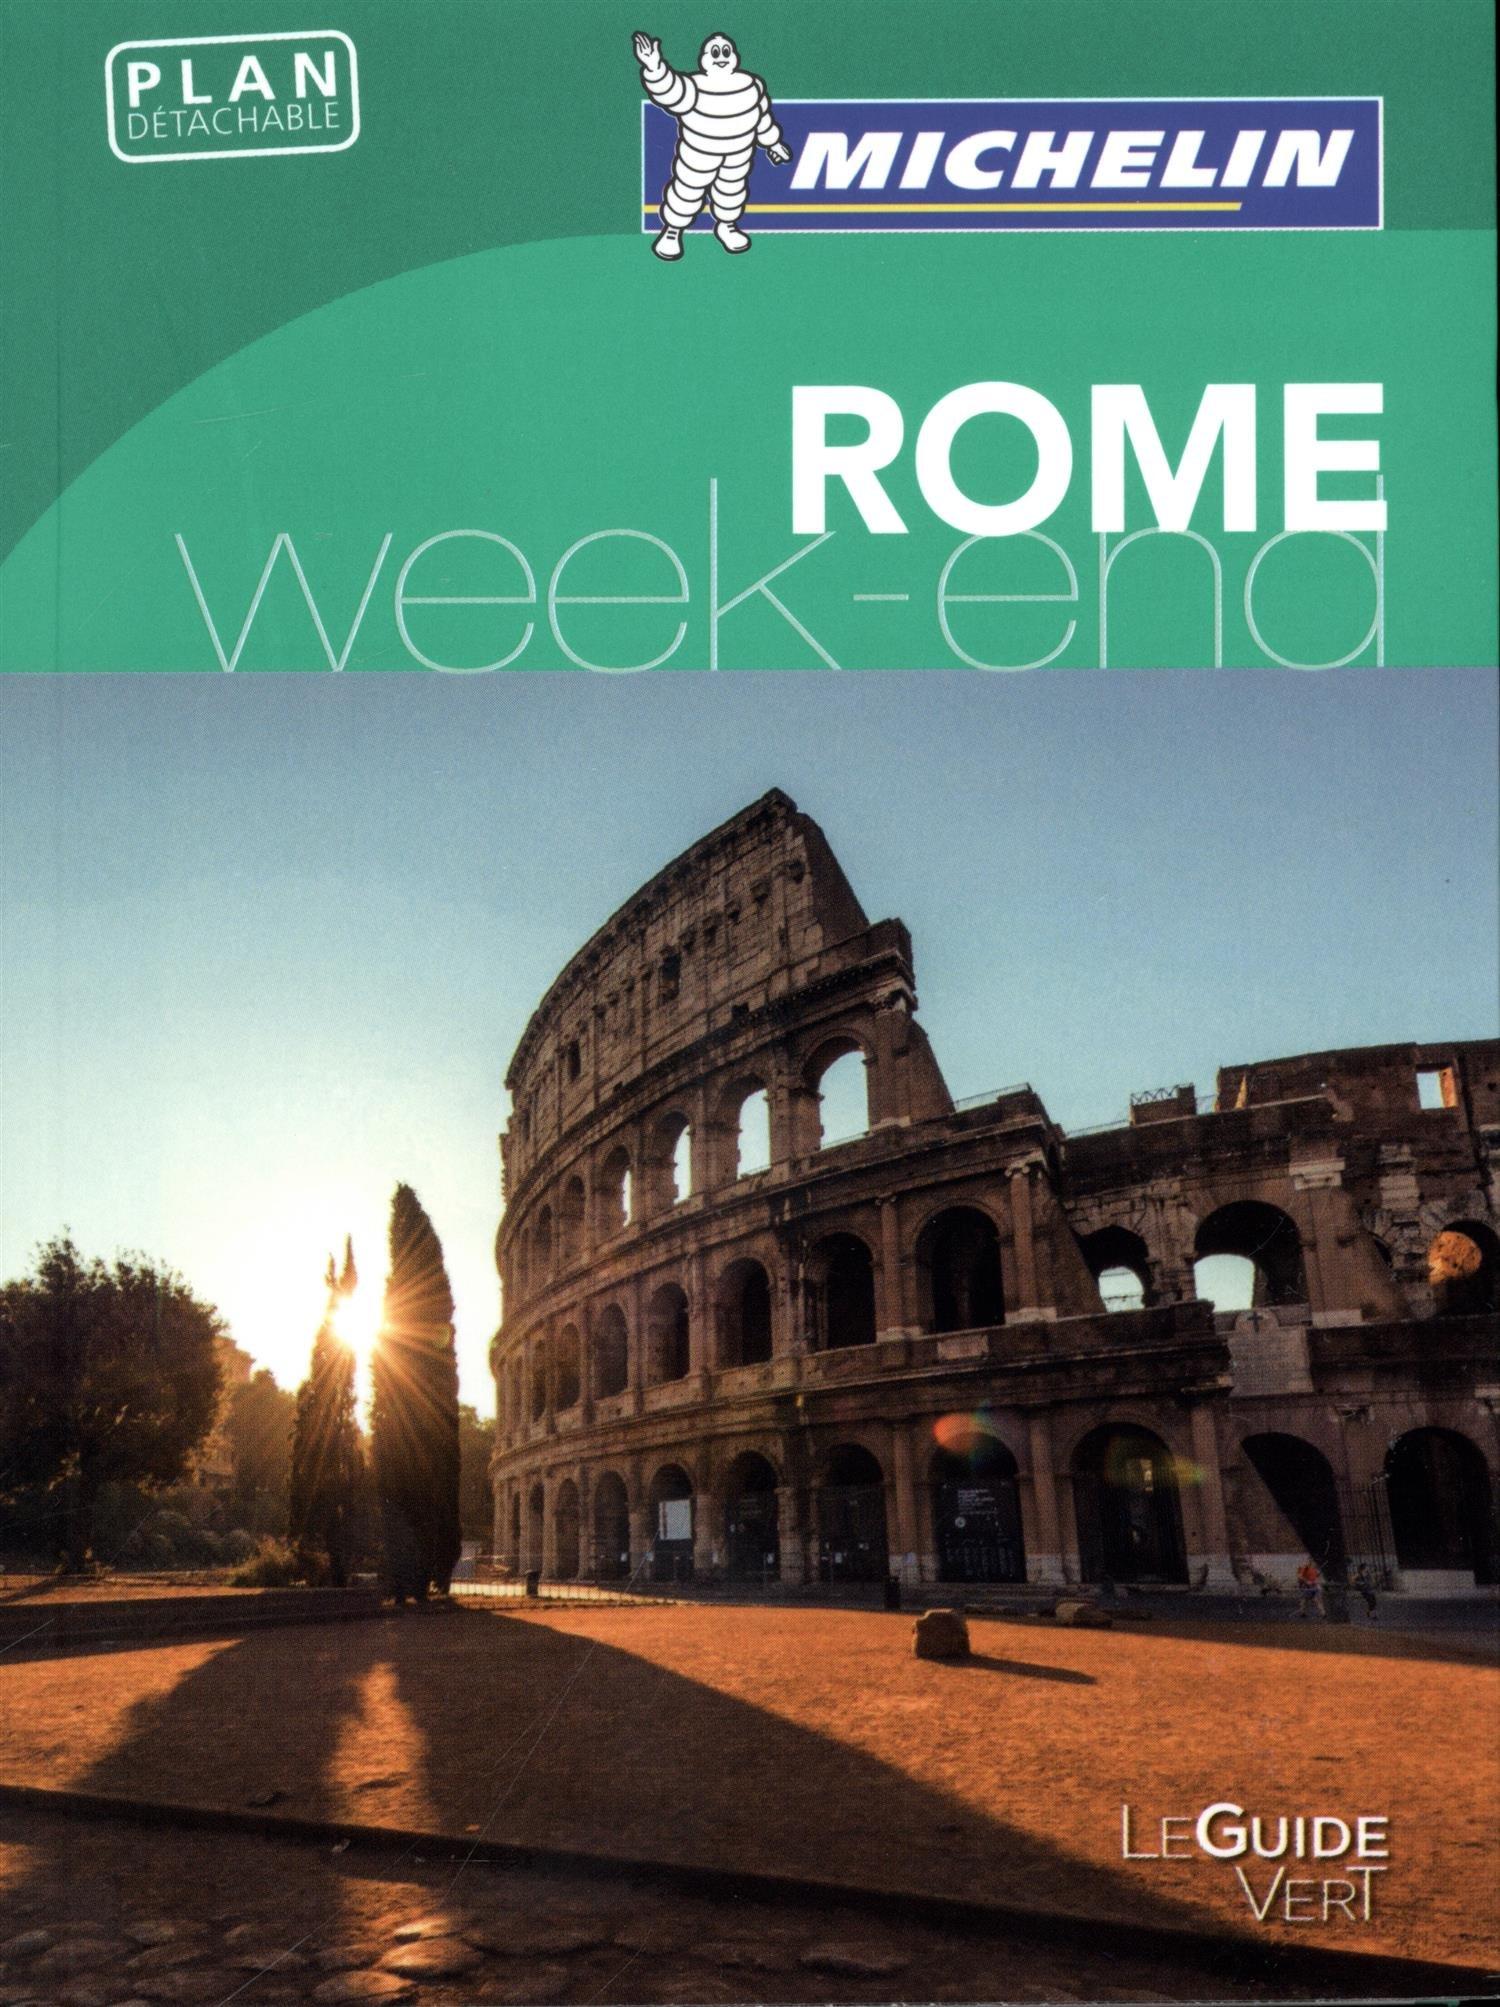 Guide Vert Week-End Rome Michelin